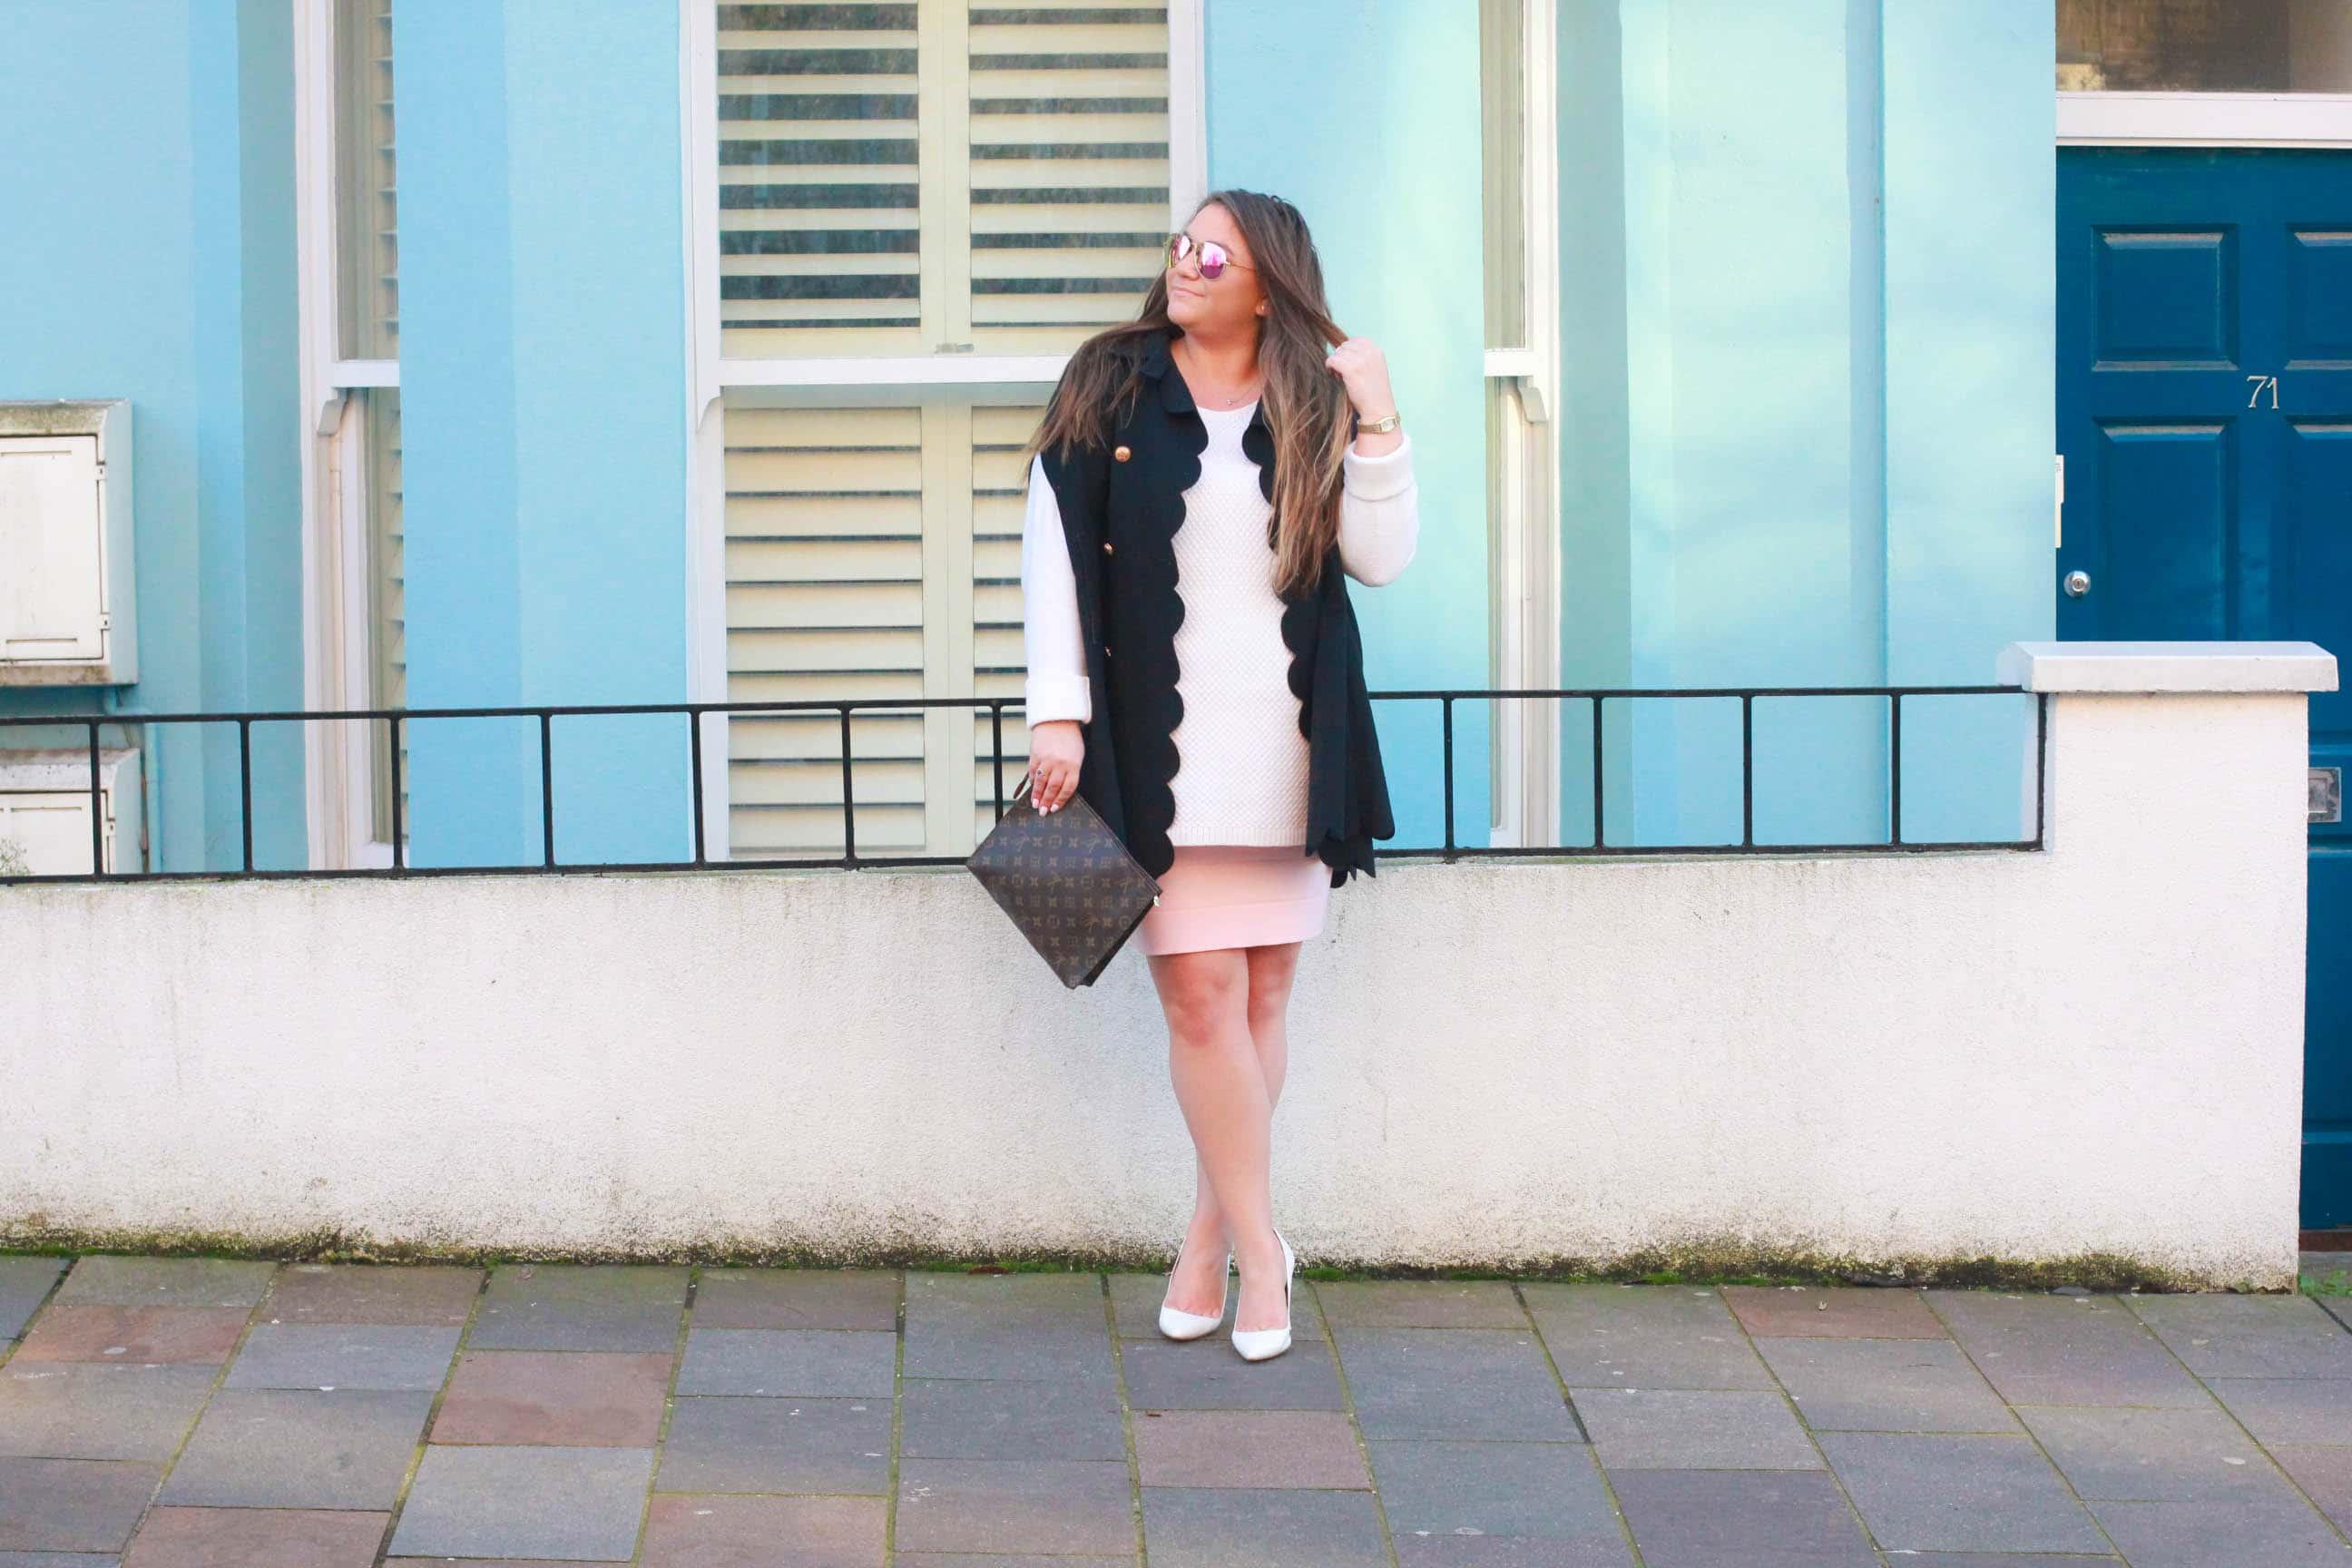 missyonmadison, missyonmadison blog, missyonmadison instagram, fashion blog, fashion blogger, style blog, style blogger, notting hill, london style, london fashion, shein cape, shein cape coat, cape coat, how to style a cape coat, how to style a cape, white cable knit sweater, bebe bandage skirt, pink bandage skirt, white pointed toe pumps, white pumps, louis vuitton, louis vuitton clutch, louis vuitton toiletry pouch, la blogger, notting hill colorful houses,